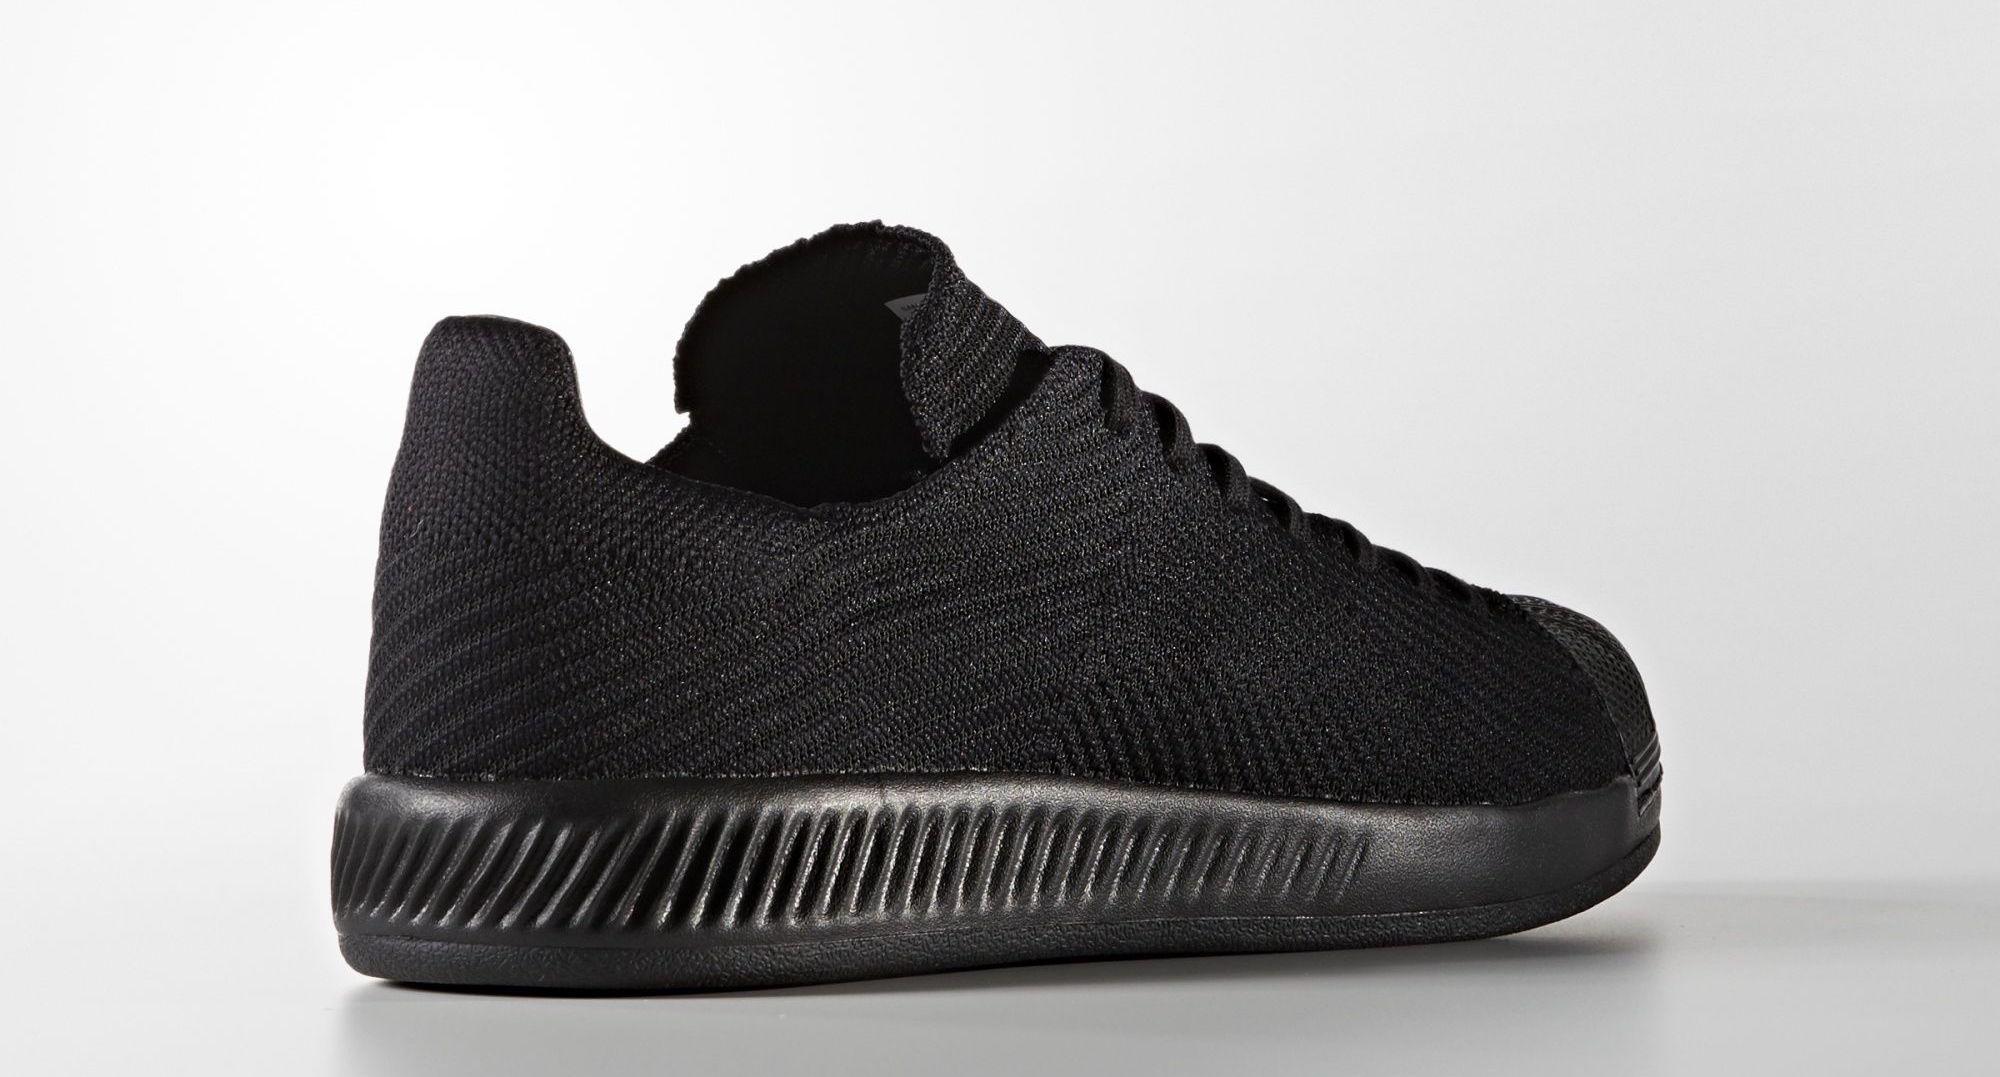 Adidas Superstar 2017